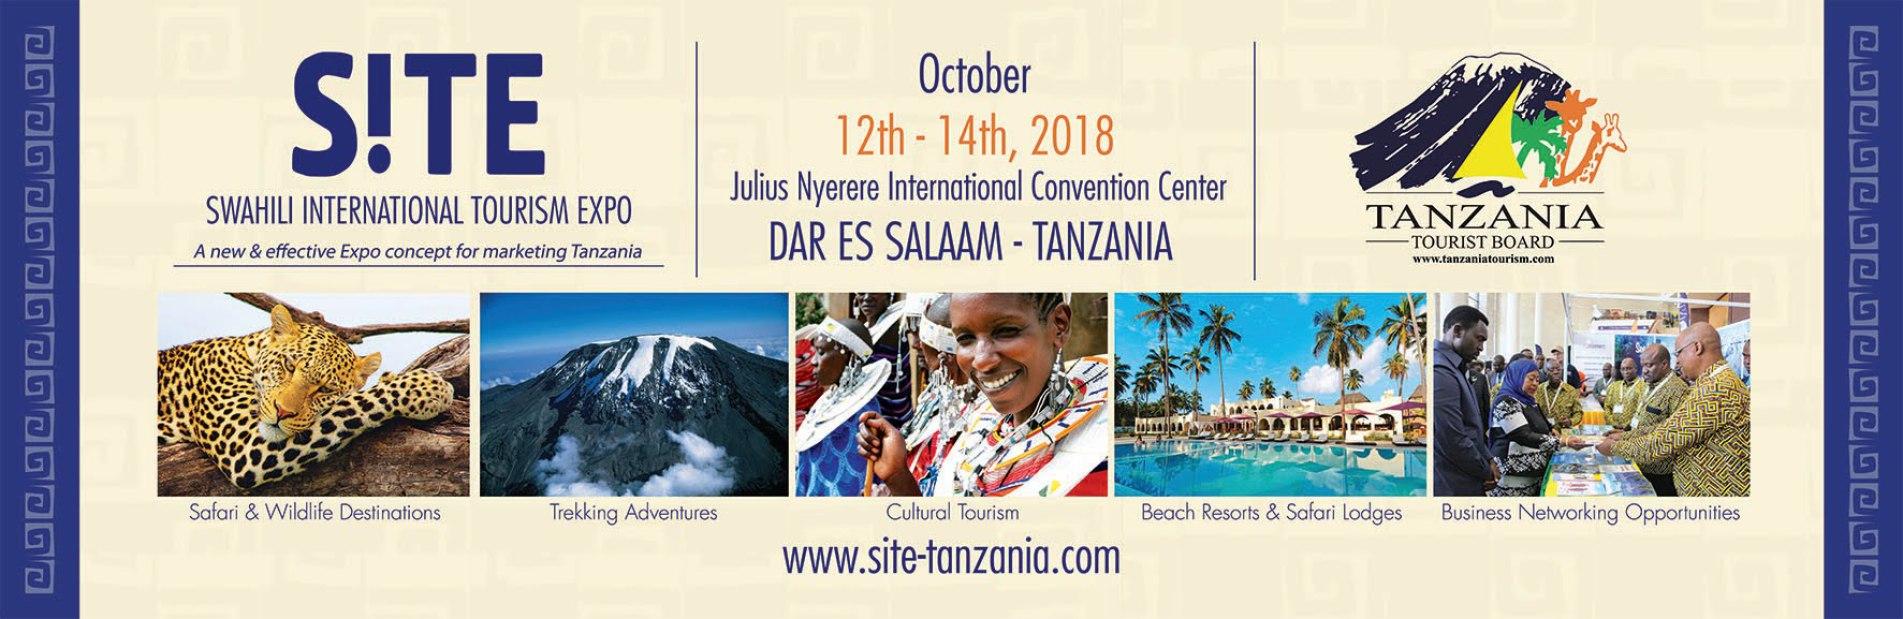 Swahili International Travel Expo 2018 – Go Places Digital